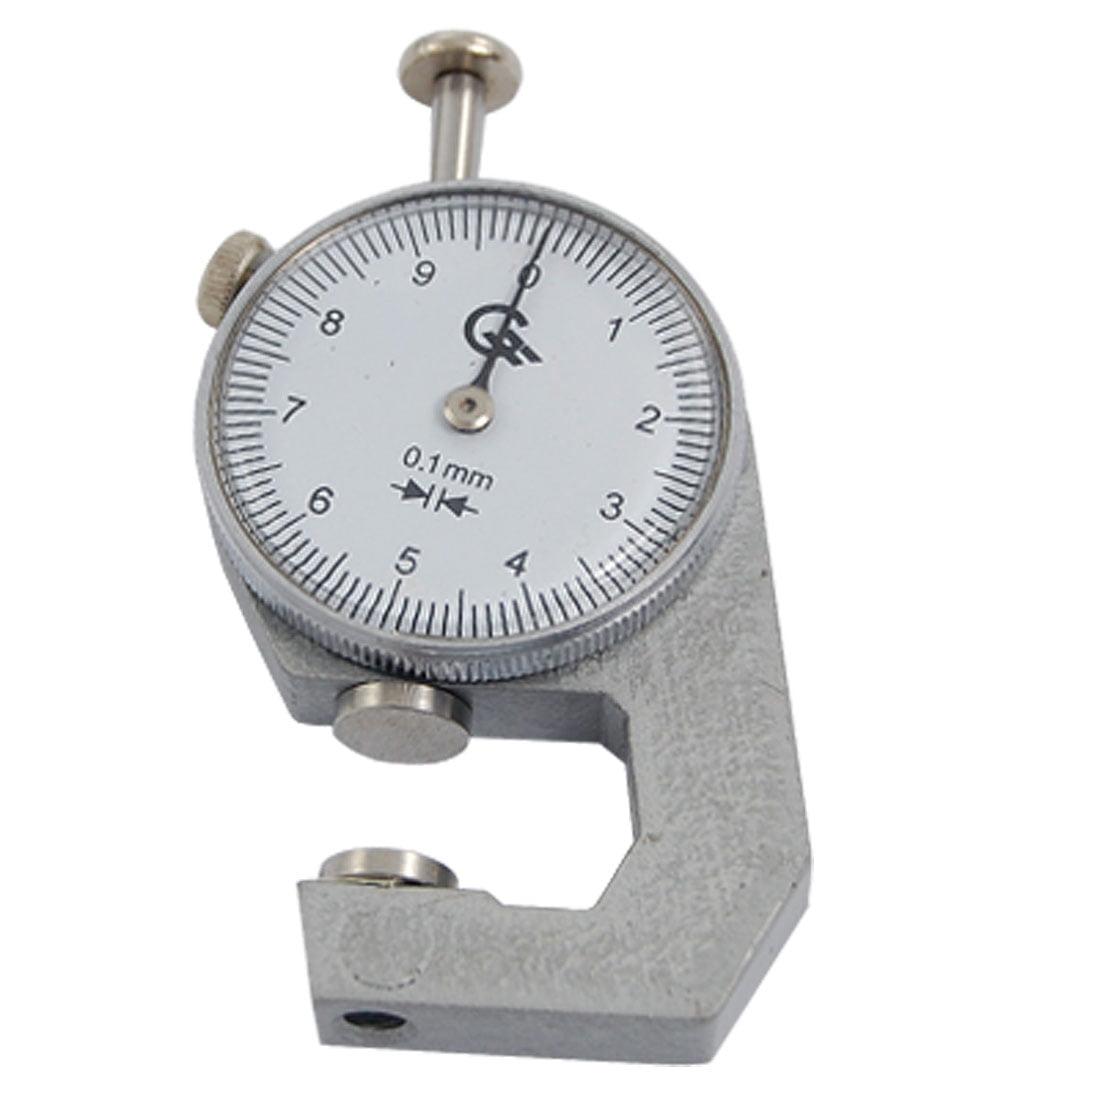 Unique Bargains Pocket Thickness Gauge Gage 0 to 10mm Measurement Tool by Unique-Bargains